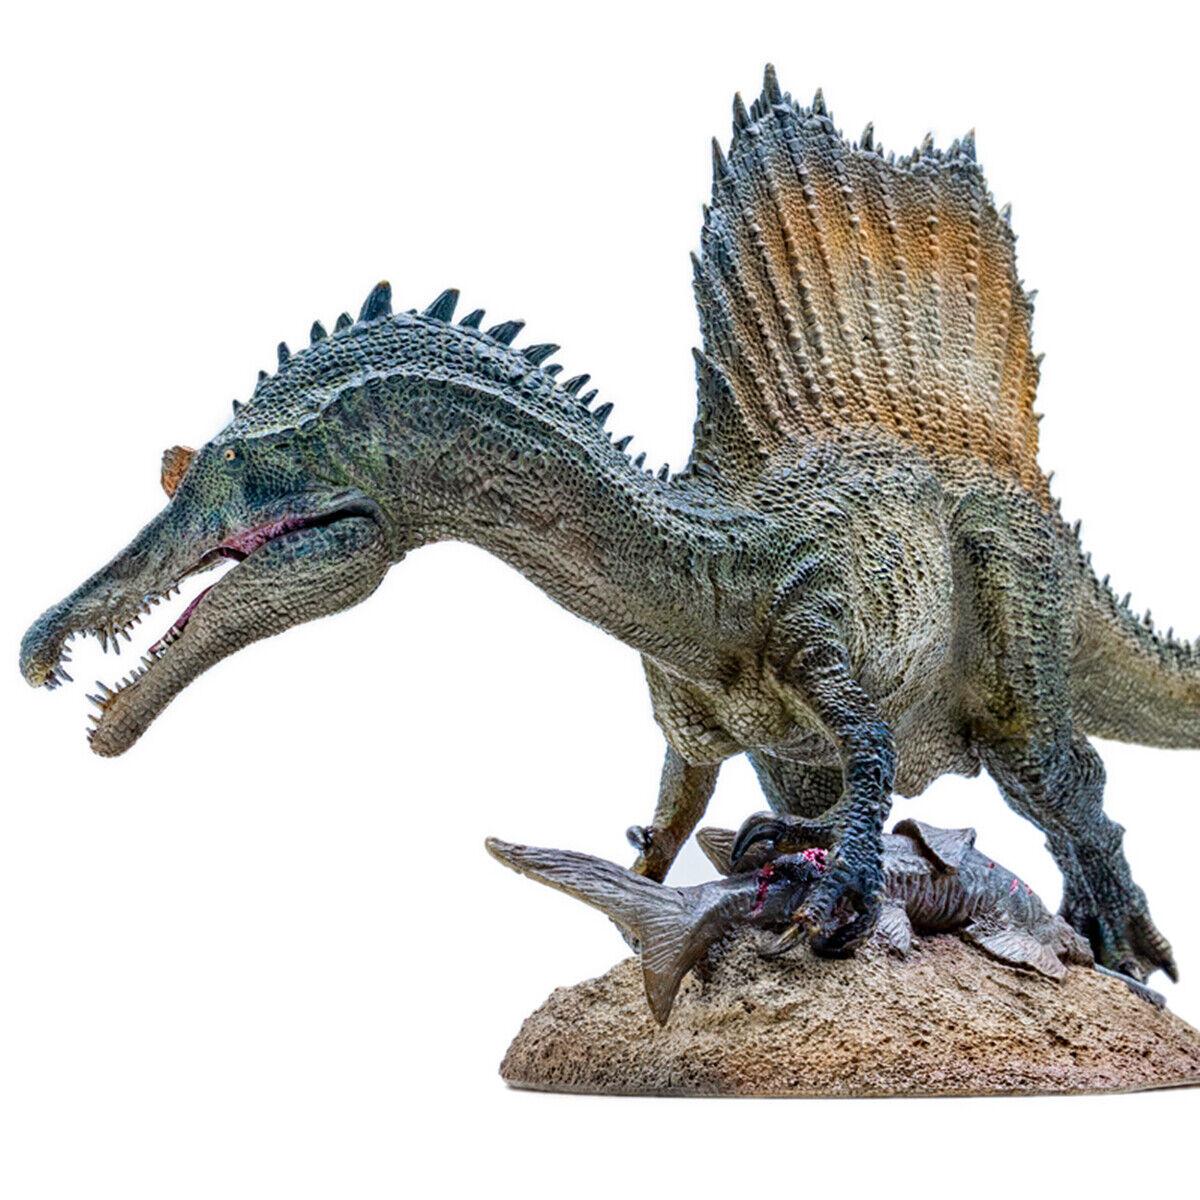 Free Shipping PNSO Mososaurs Mosasaurus Figure Dinosaur 1//35 Animal Collector